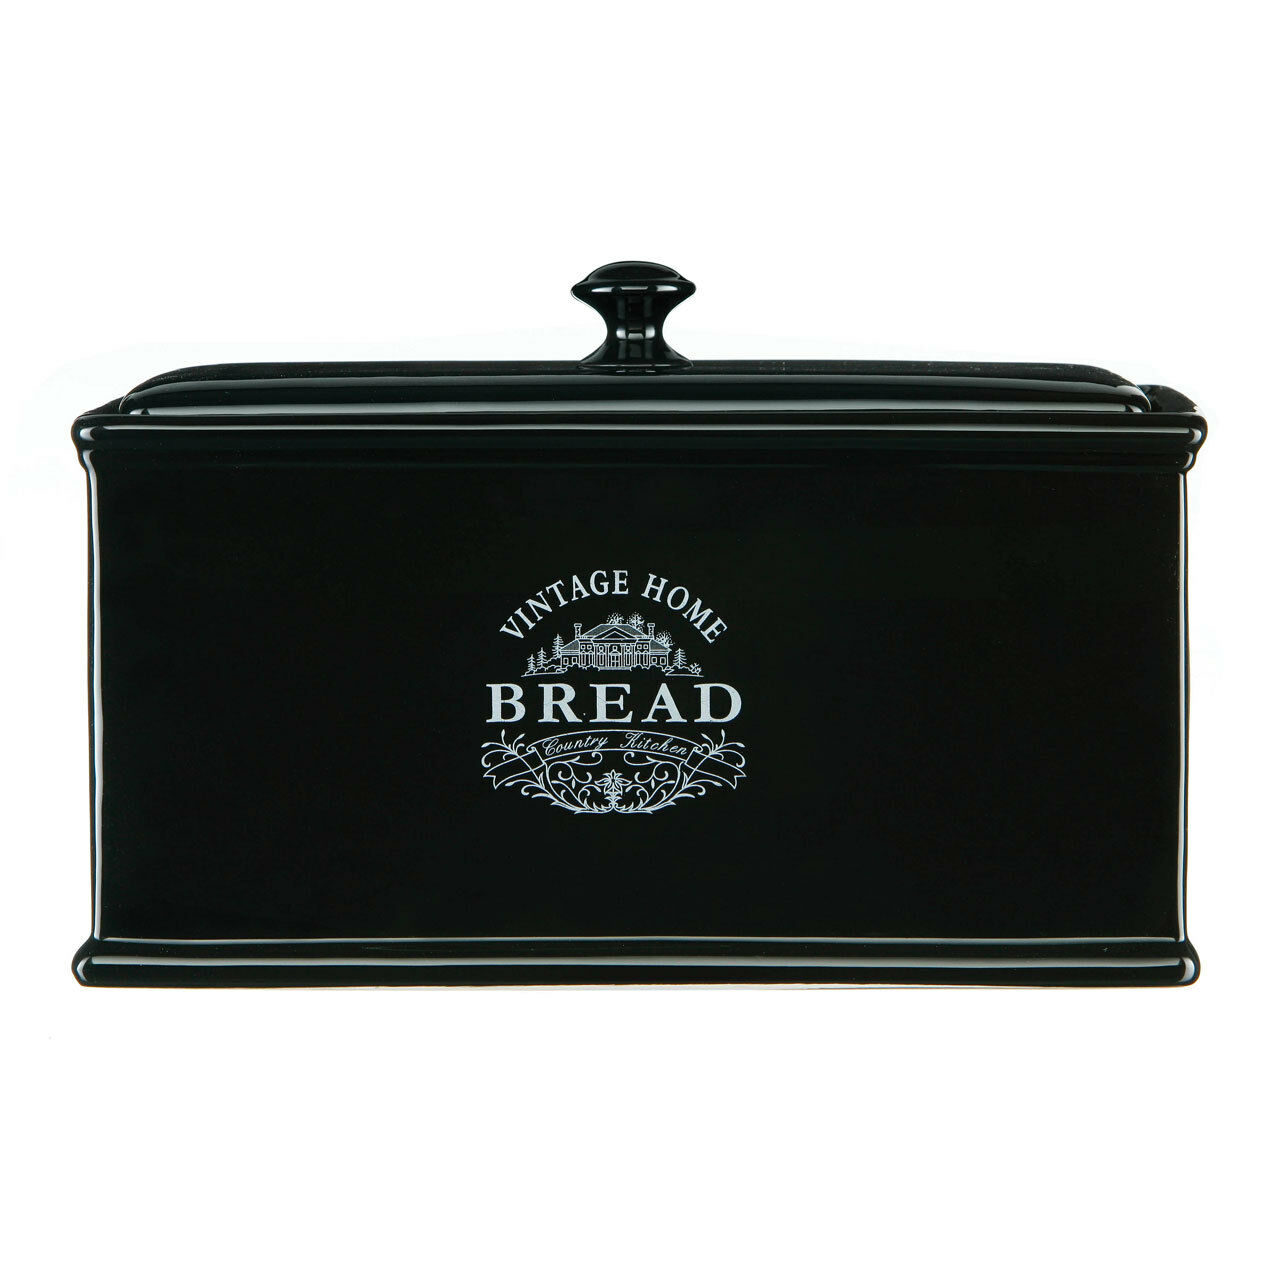 Negro Vintage Pan Caja Frasco Casa De Cerámica Cocina Country Frascos de almacenamiento